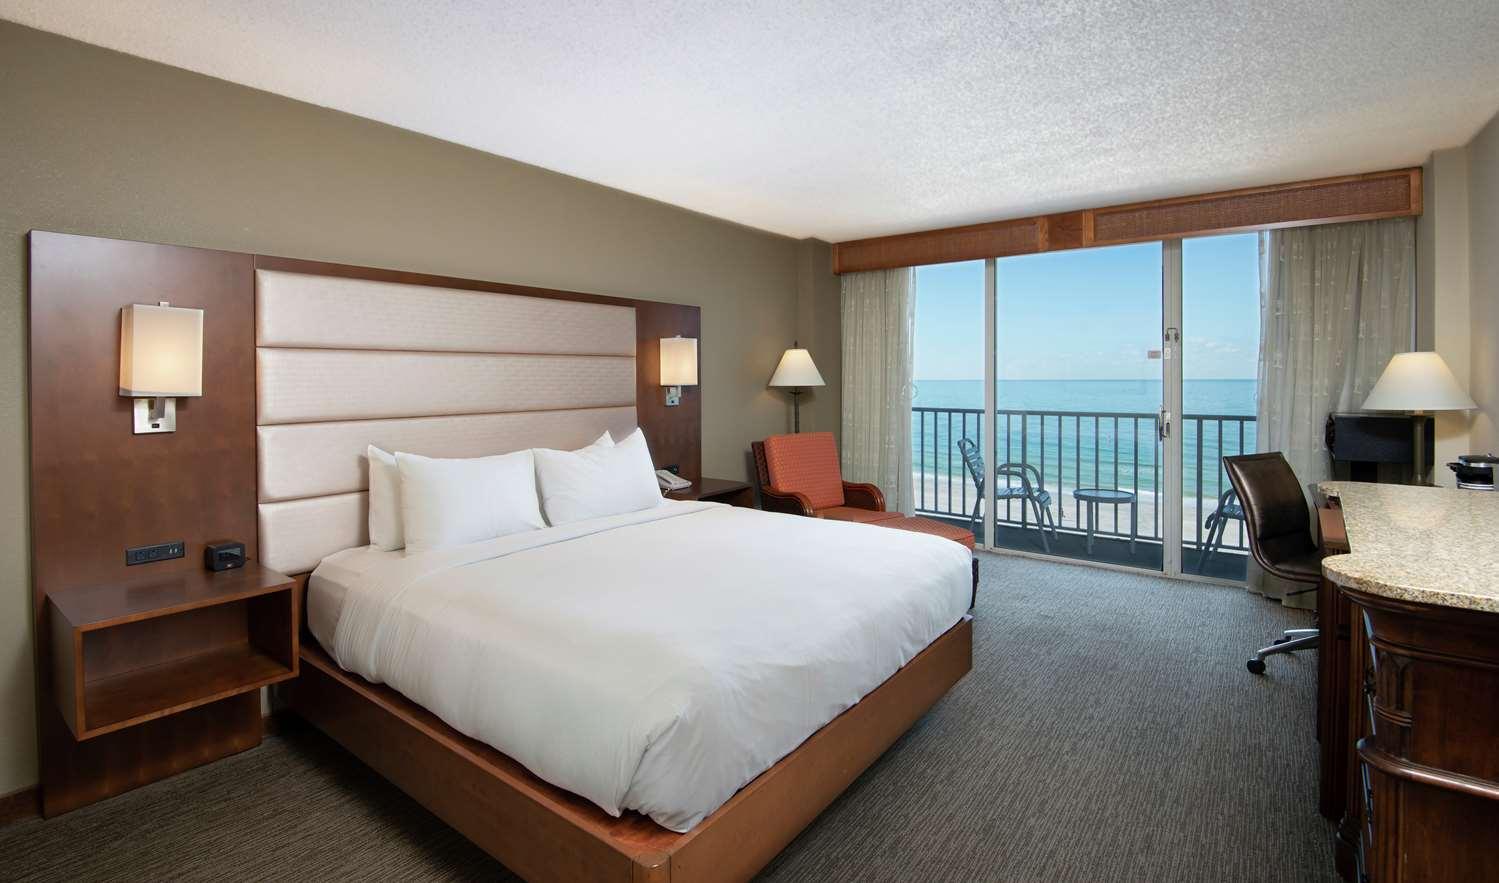 Room - DoubleTree by Hilton Hotel North Redington Beach